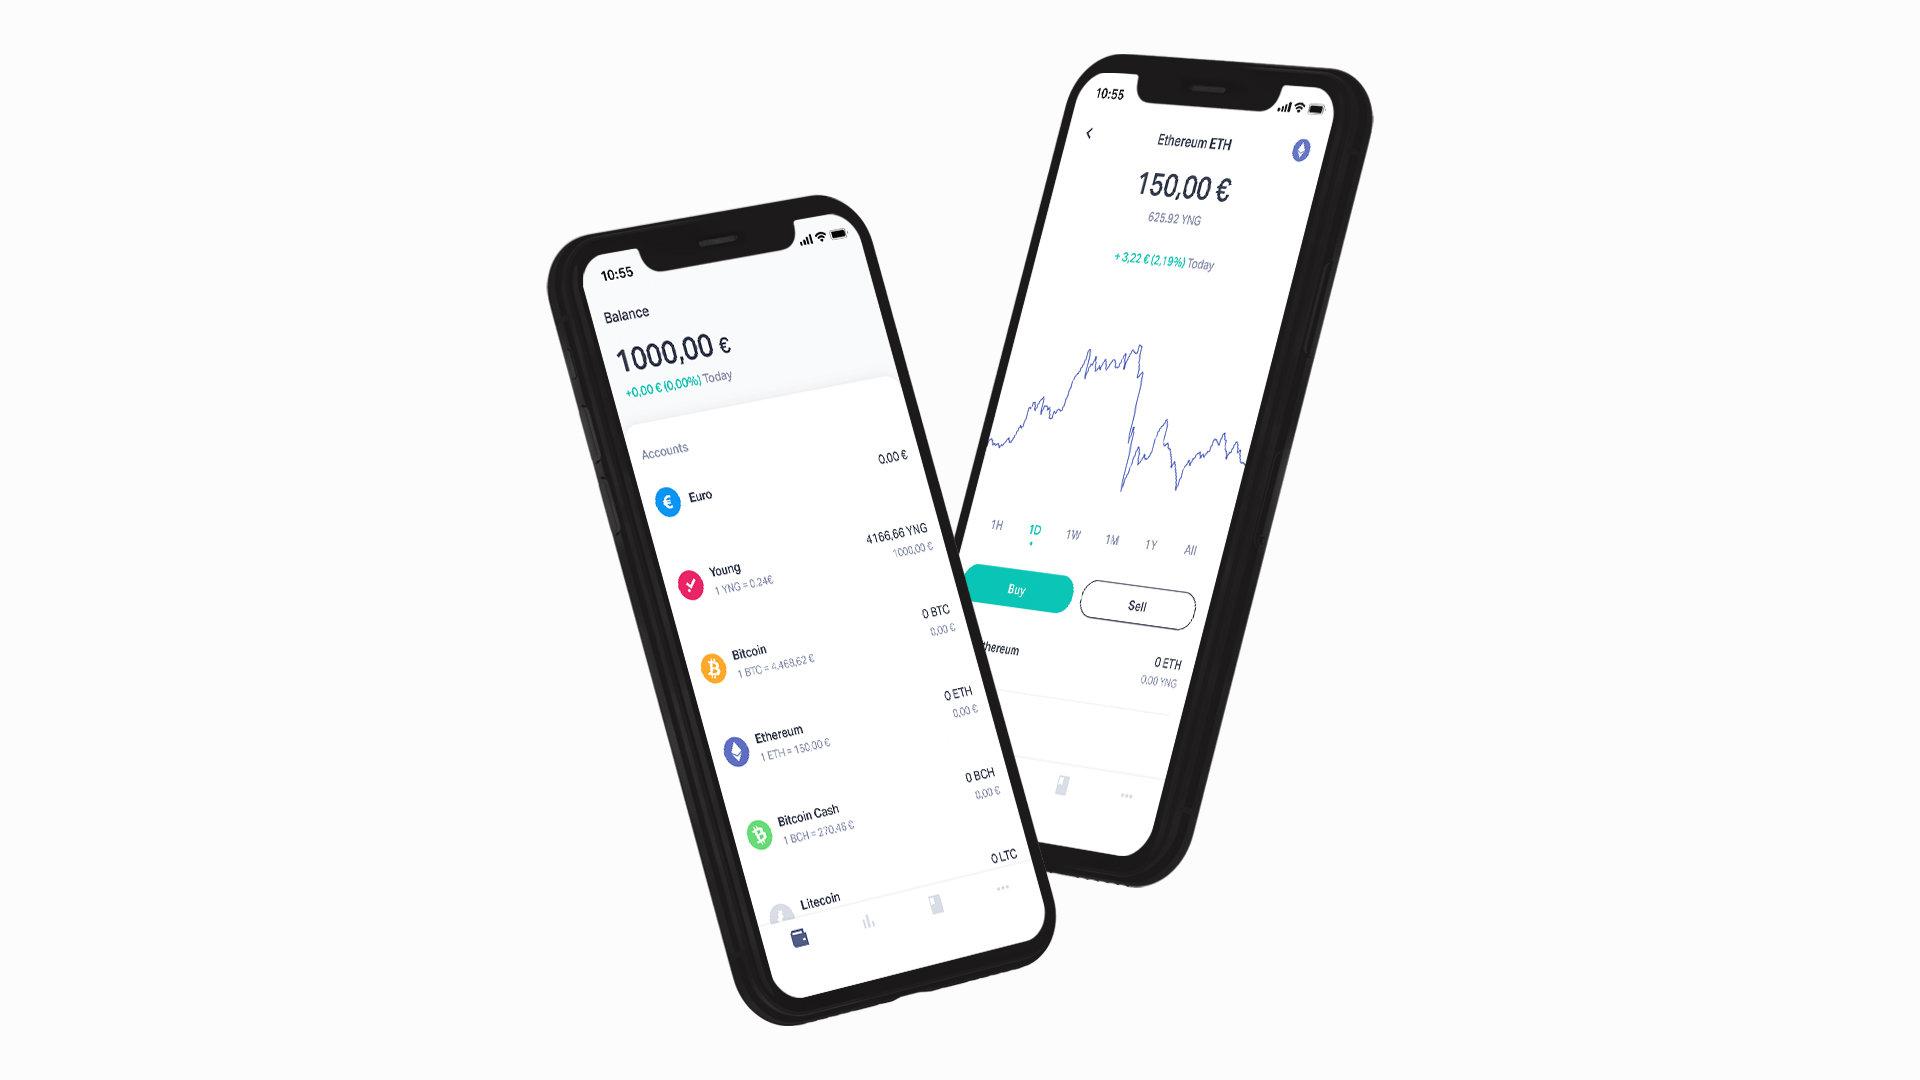 Young Platform: al via il crowdfunding per l'app valutata 8,5 milioni